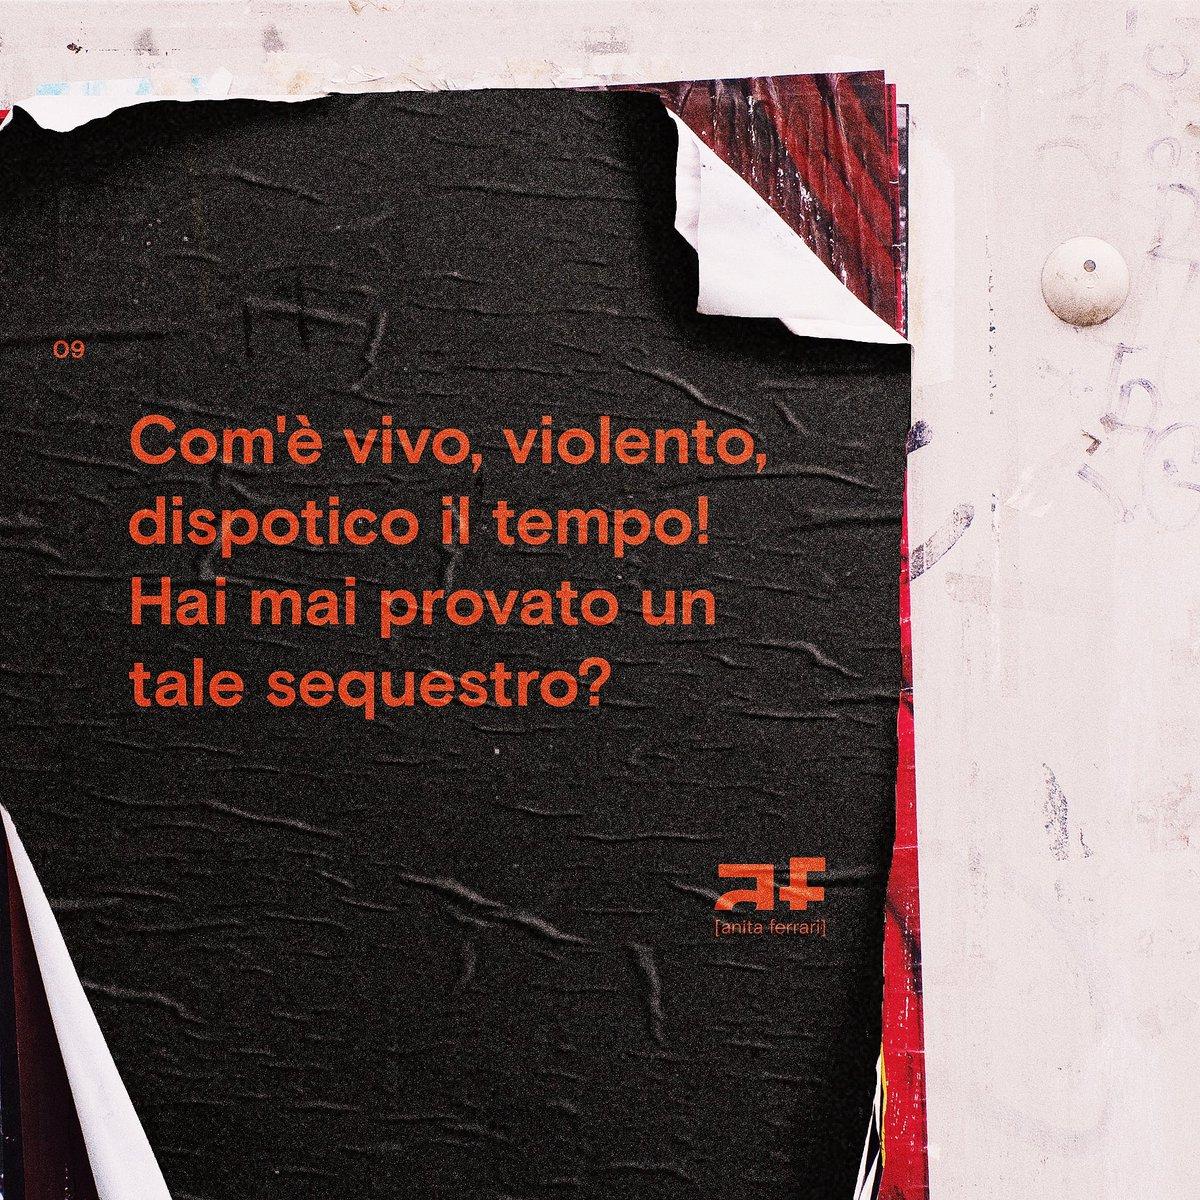 #anitaferrari #poesia #poesiacontemporanea #letteraturaitaliana #poesiaitaliana #poesiadistrada #letteratura #mep #frasivere #frasitumblr #frasiitaliane #frasidolci #frasiamore #testi #frasibelle #leggere #libri #scrivere #citazioni #aforismi #versi #frasirap #vita #scrittoripic.twitter.com/6W7u4KaPIz